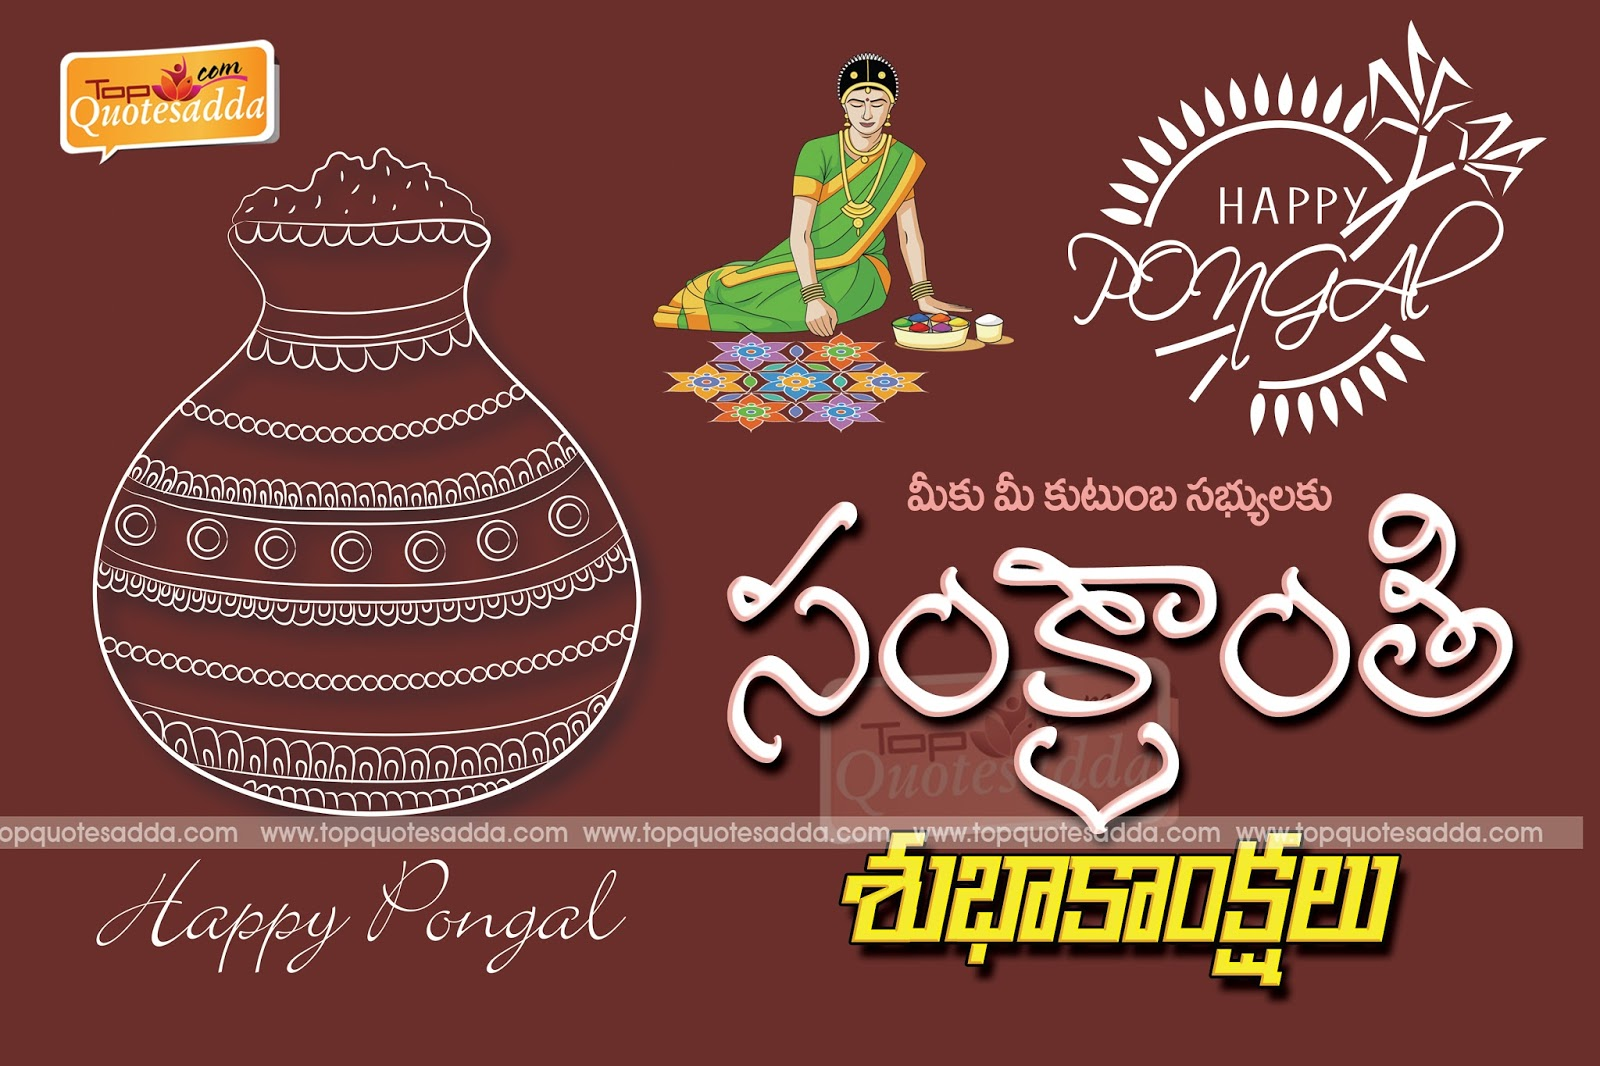 Happy Sankranti Greetings And Quotes In Telugu Topquotesadda